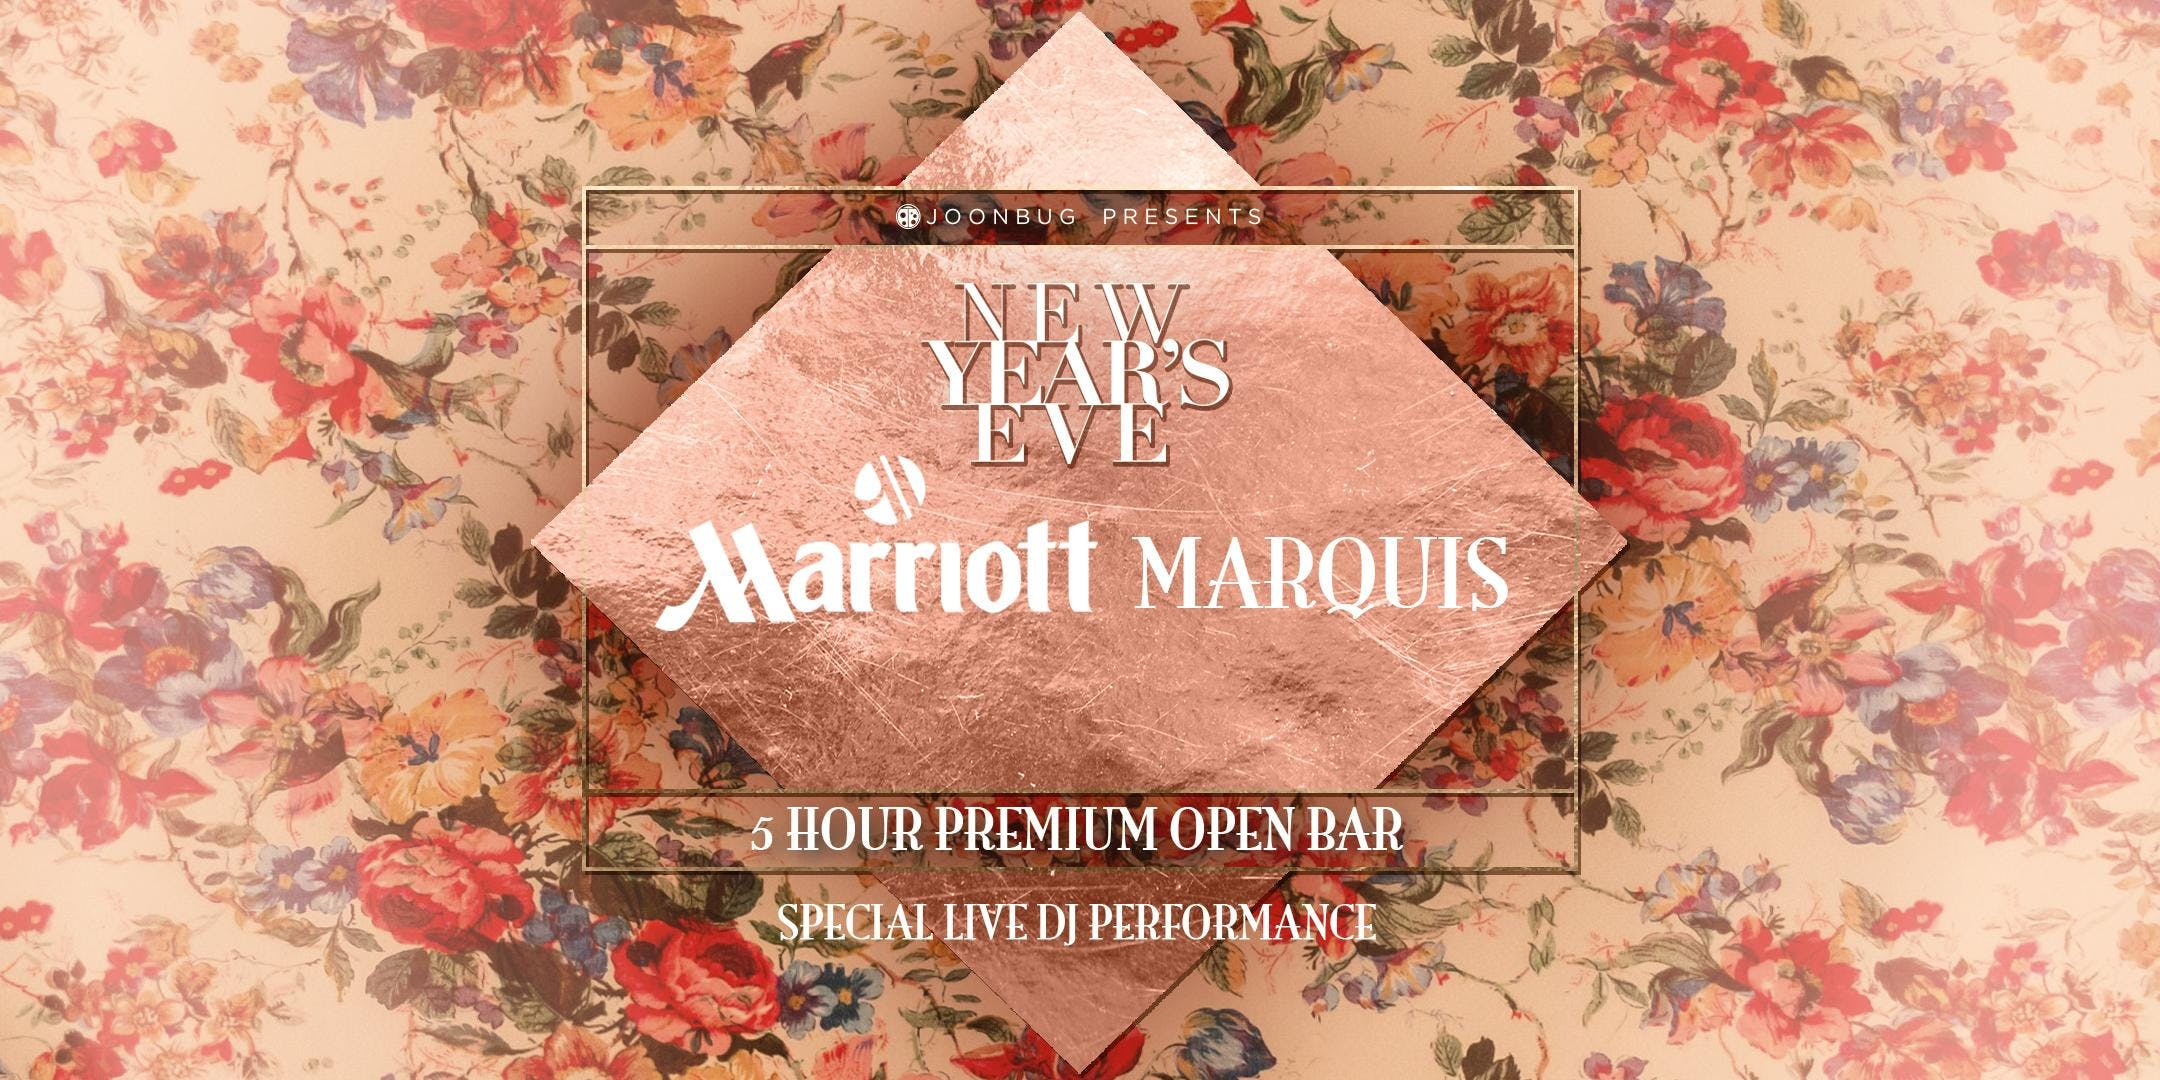 Joonbug.com Presents Marriott Marquis New Yea